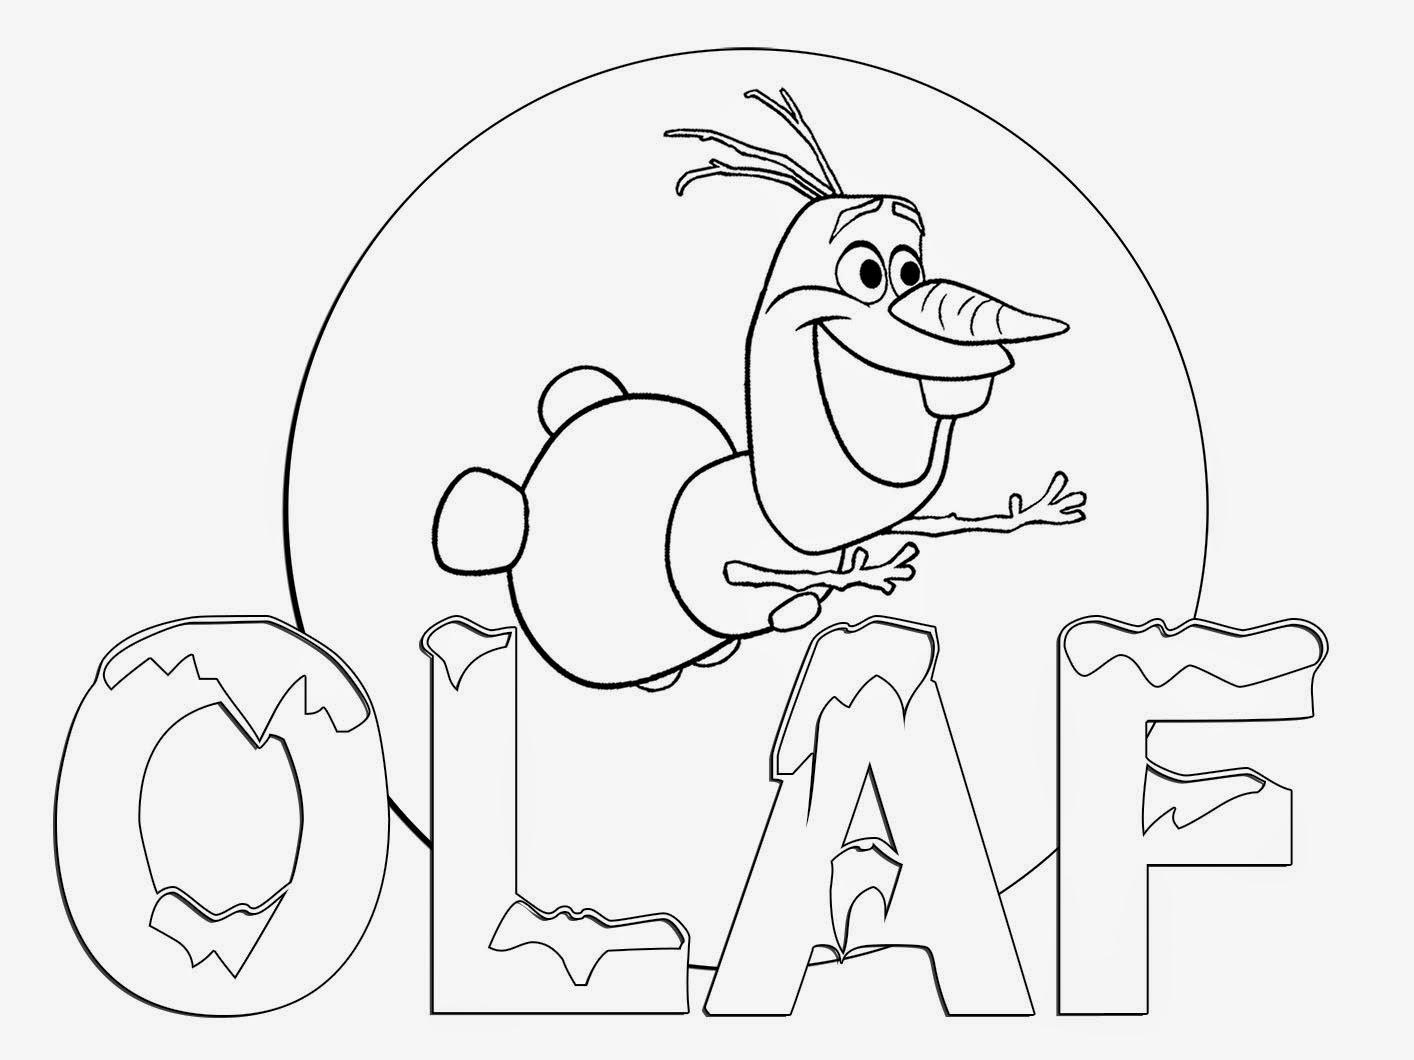 frozen coloring page frozen coloring pages getcoloringpagescom page frozen coloring 1 1